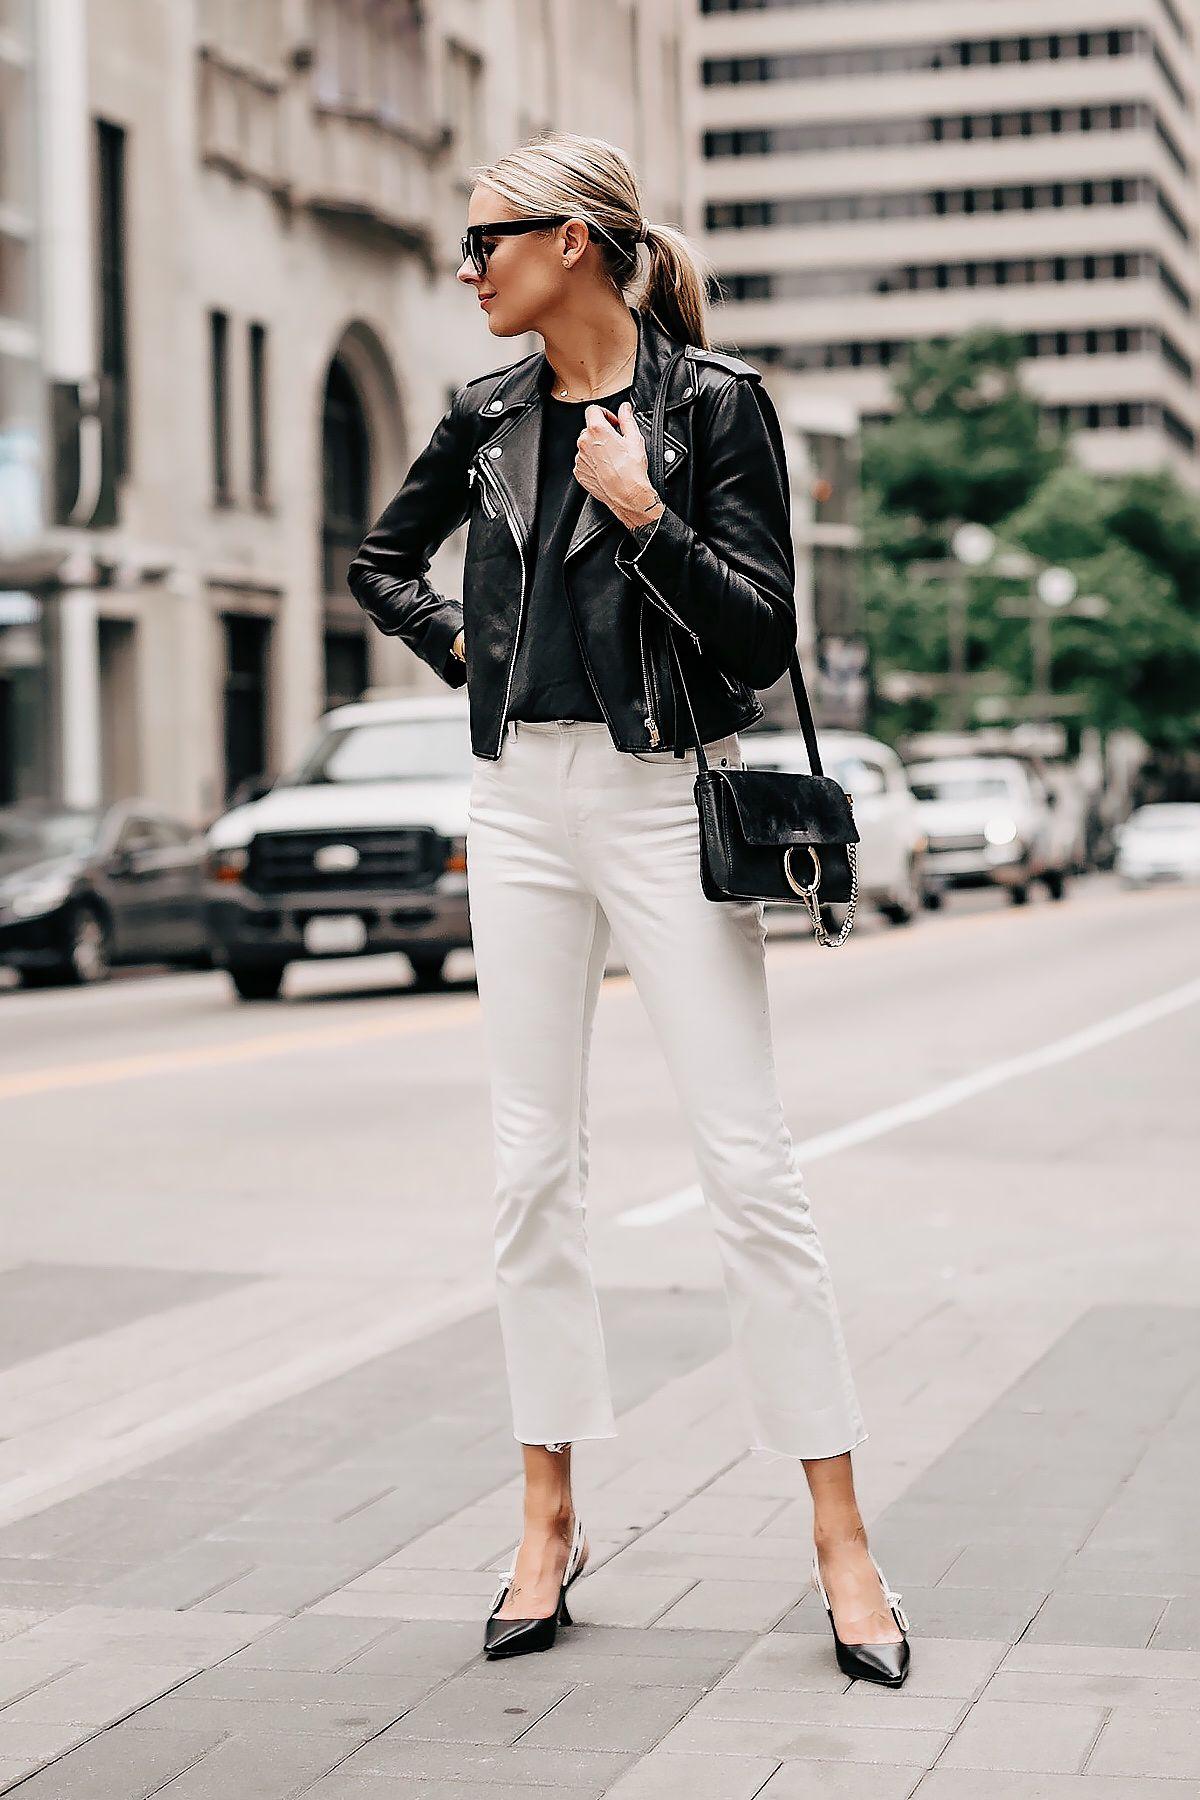 264c2d5daa826d Blonde Woman Wearing Black Leather Jacket Black Top White Cropped Jeans  Dior Slingback Heels Chloe Faye Black Handbag Fashion Jackson San Diego  Fashion ...